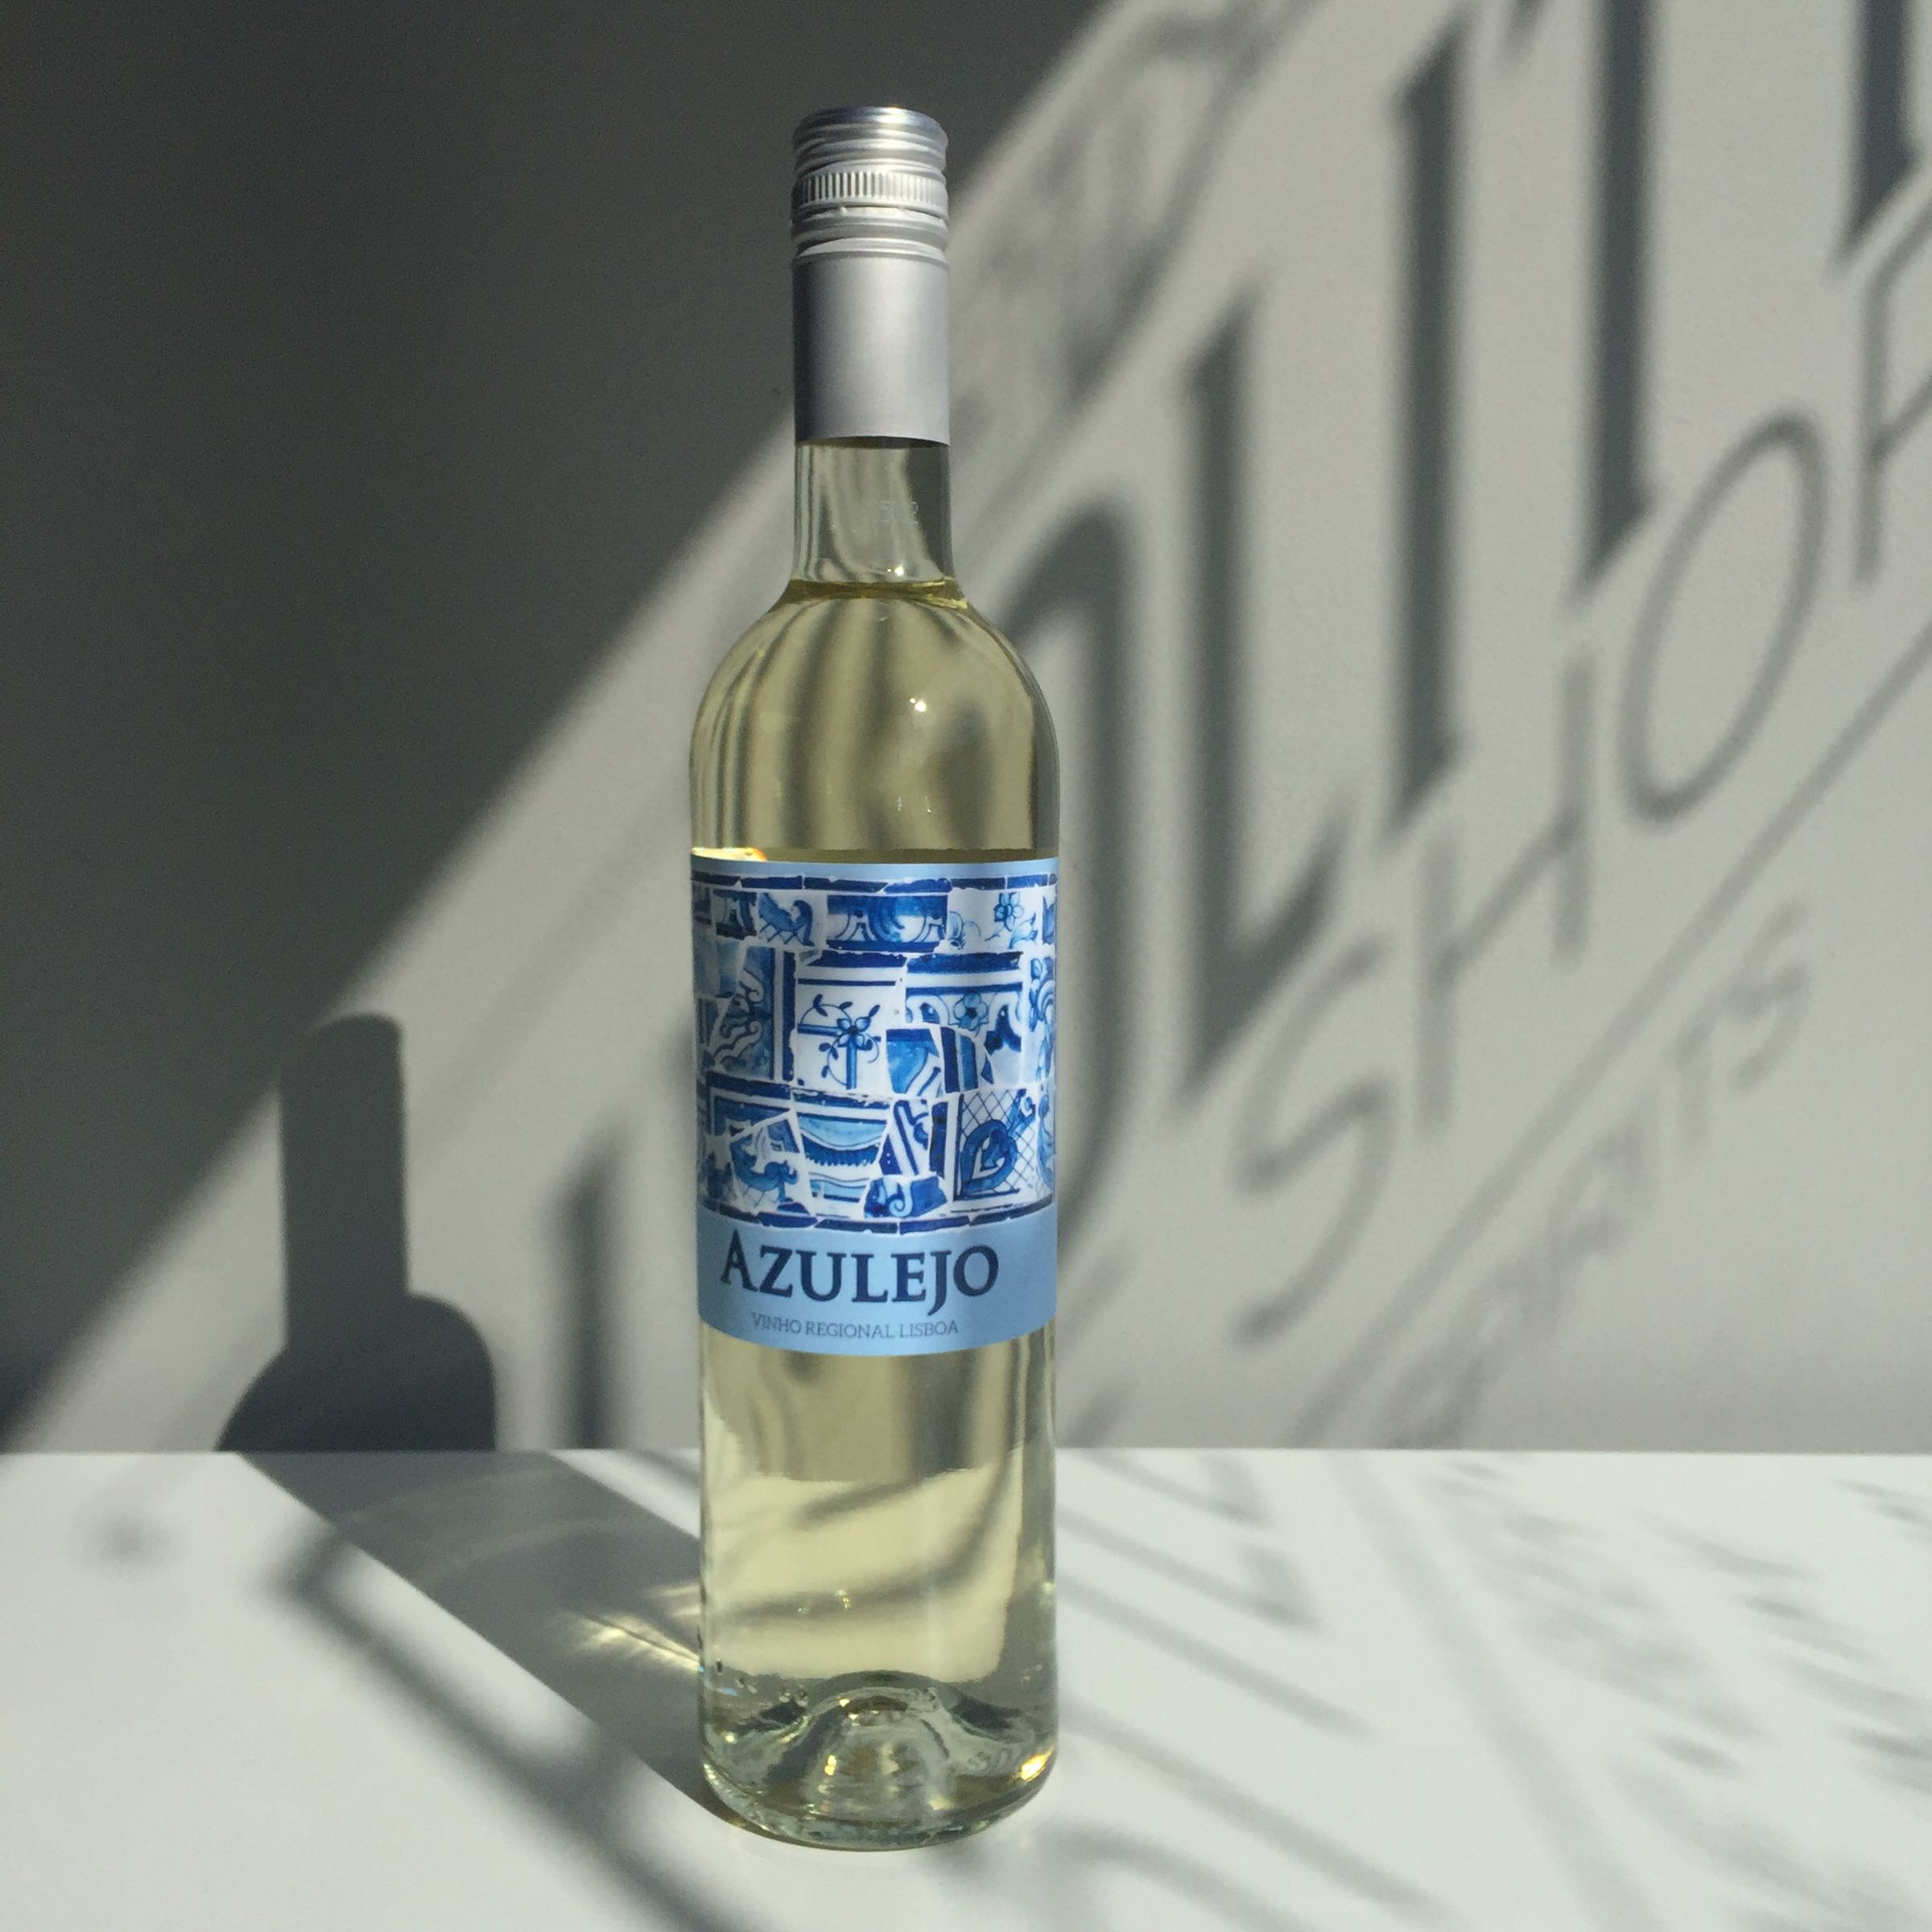 Azulejo White